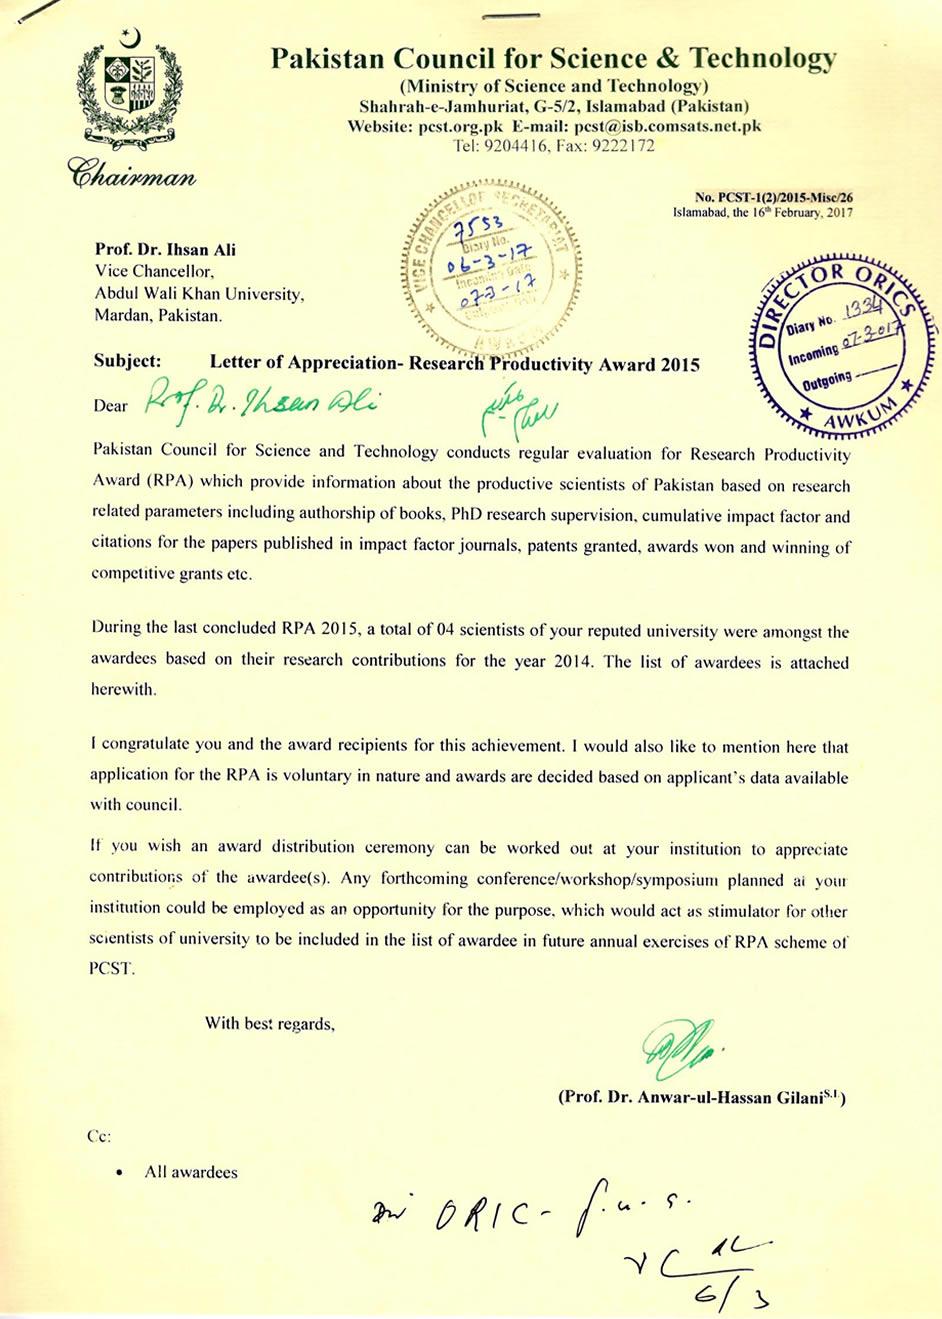 Abdul wali khan university mardan letter of appreciation research letter of appreciation research productivity award 2015 spiritdancerdesigns Images